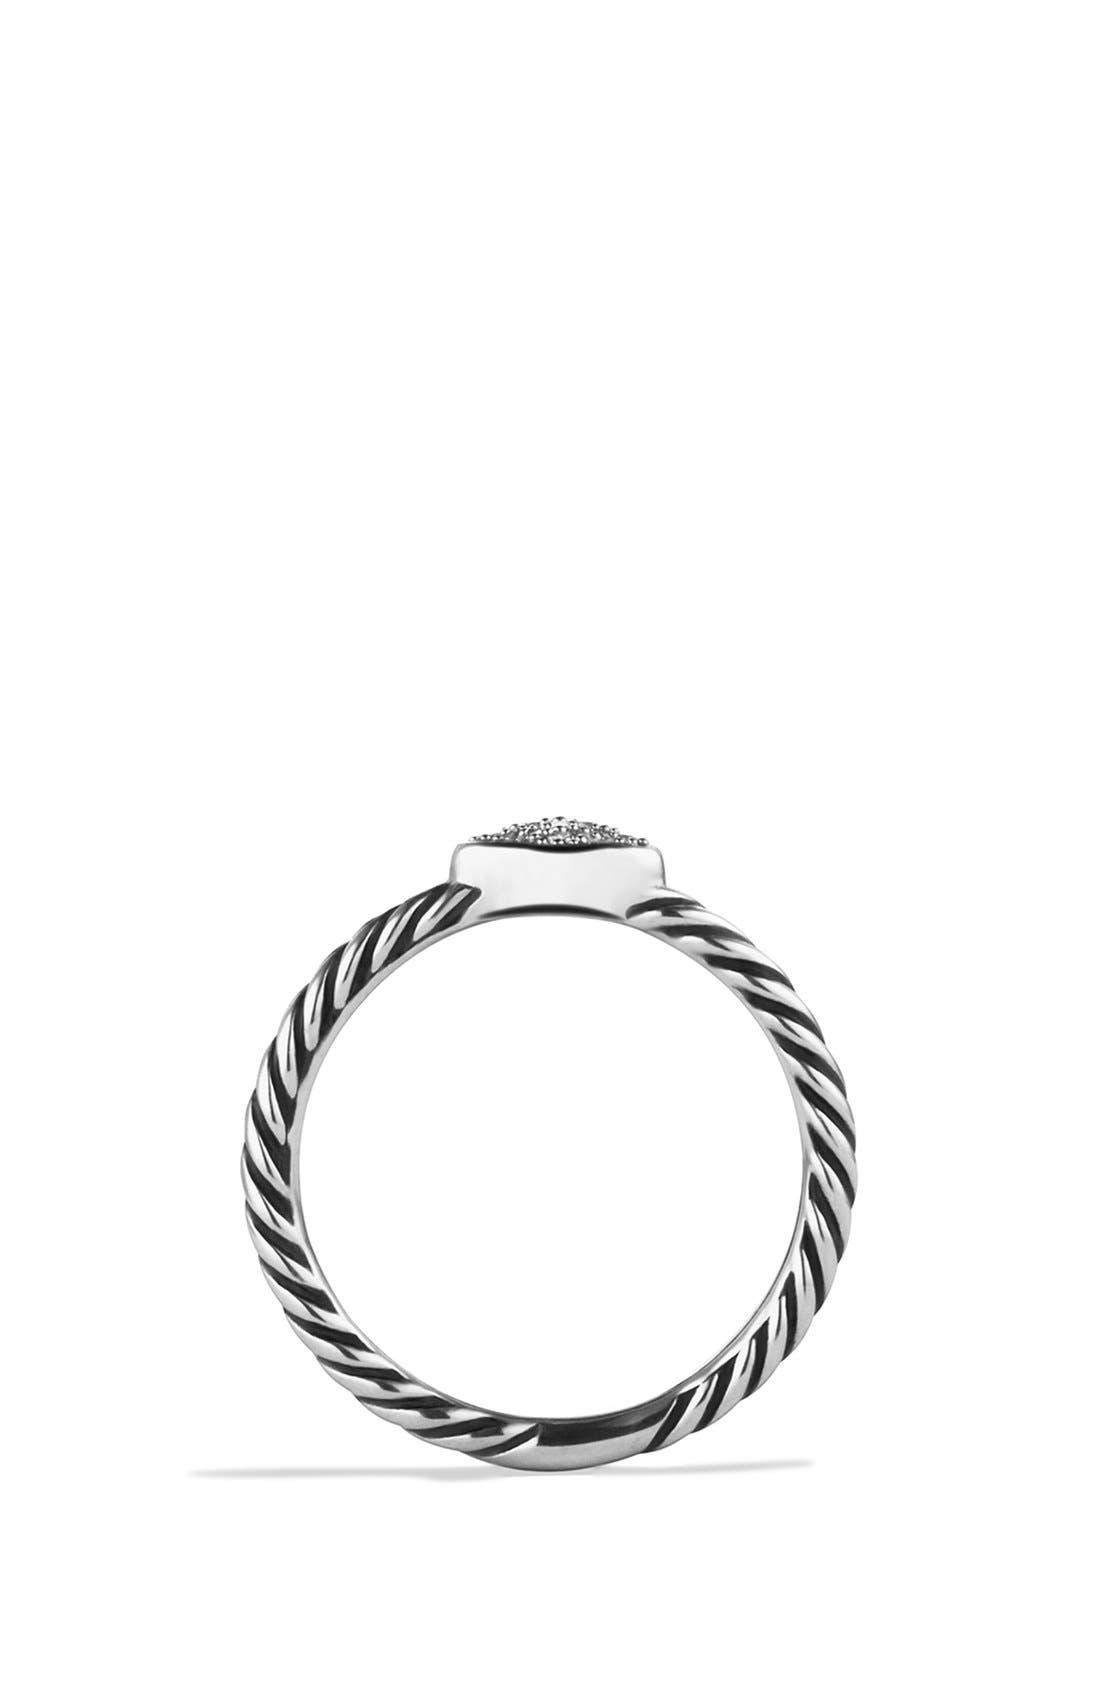 'Cable Collectibles - Quatrefoil' Ring with Diamonds,                             Alternate thumbnail 4, color,                             DIAMOND